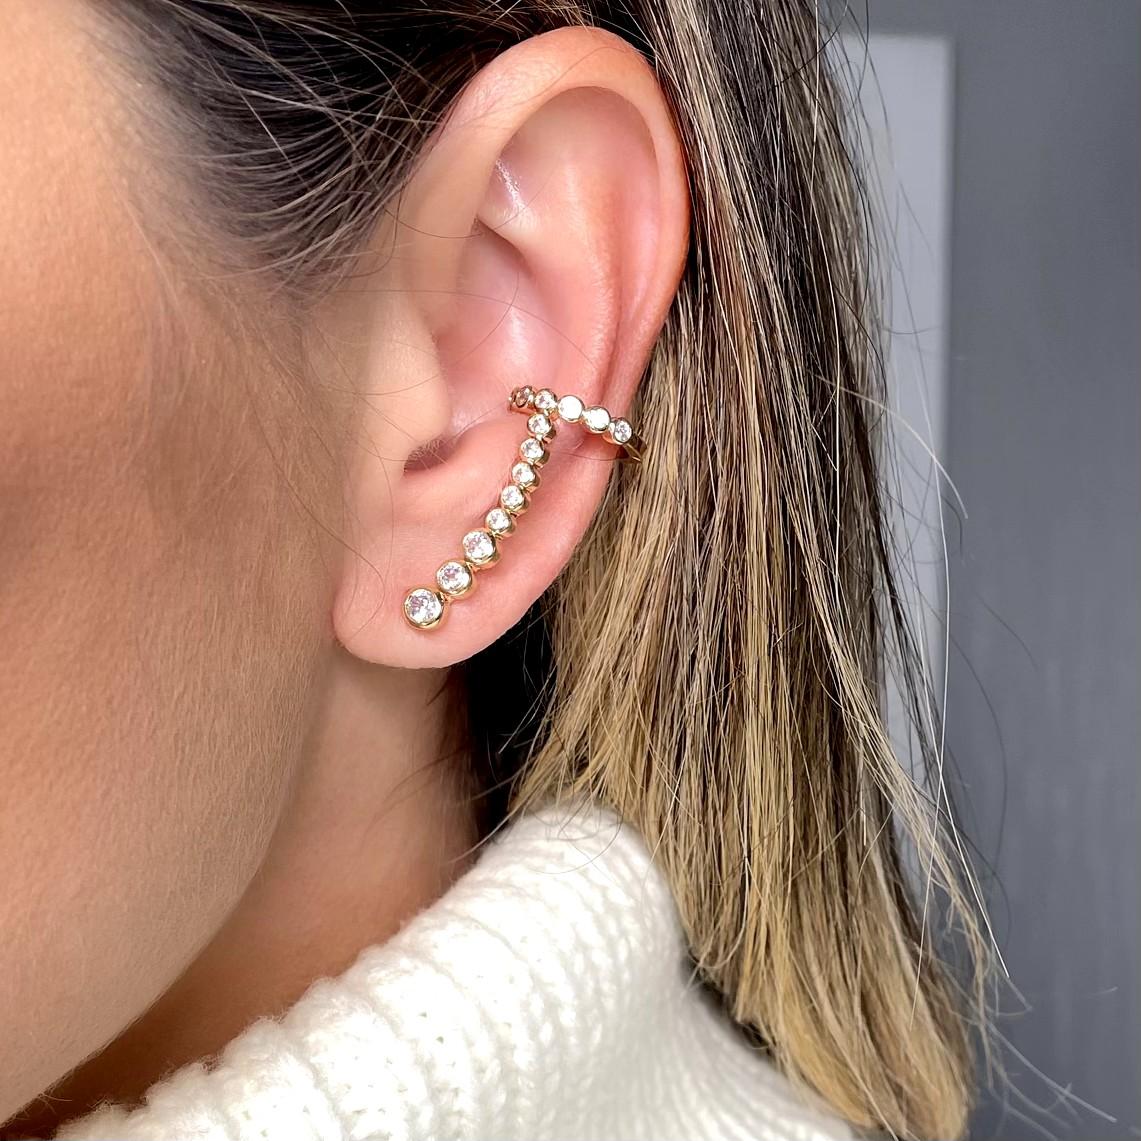 Brinco Ear Cuff Zirconias com Piercing Banho Ouro